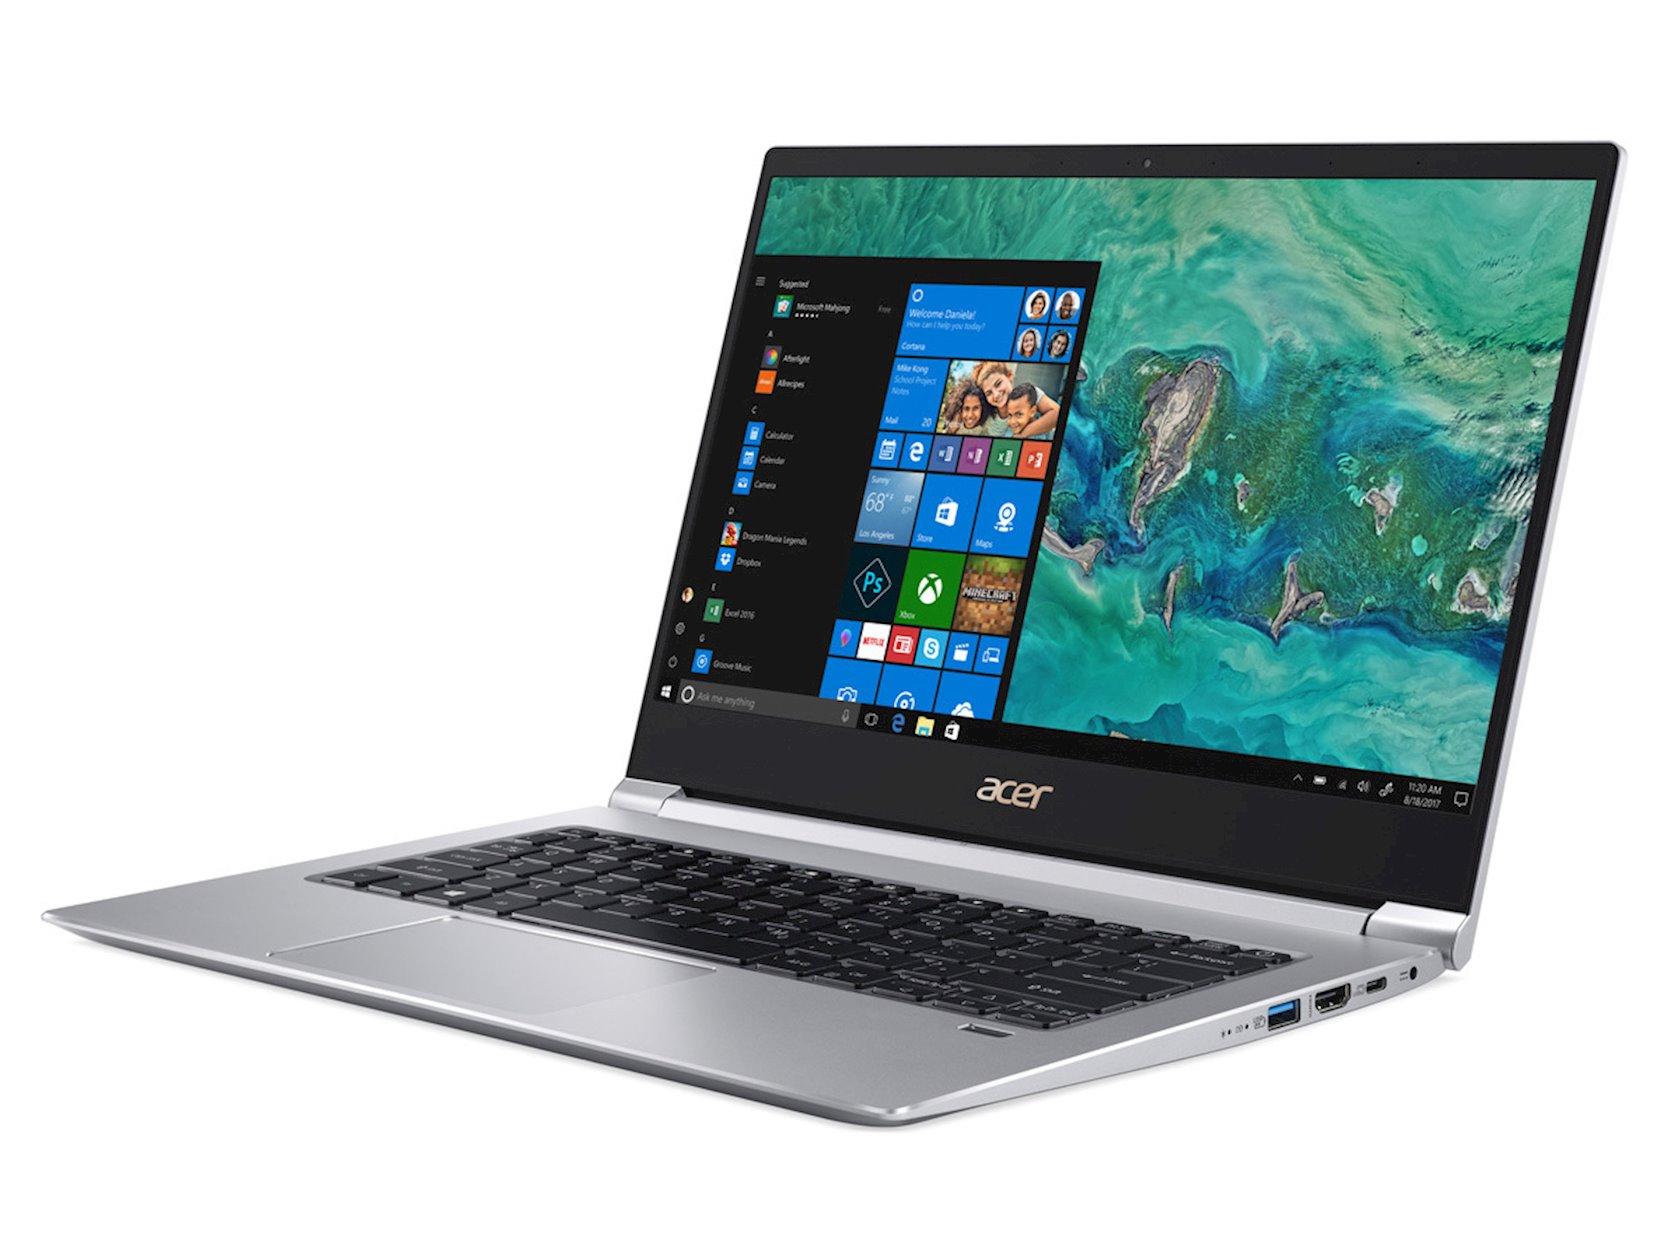 Noutbuk Acer Swift 3 SF314-55 (NX.H3WER.010)